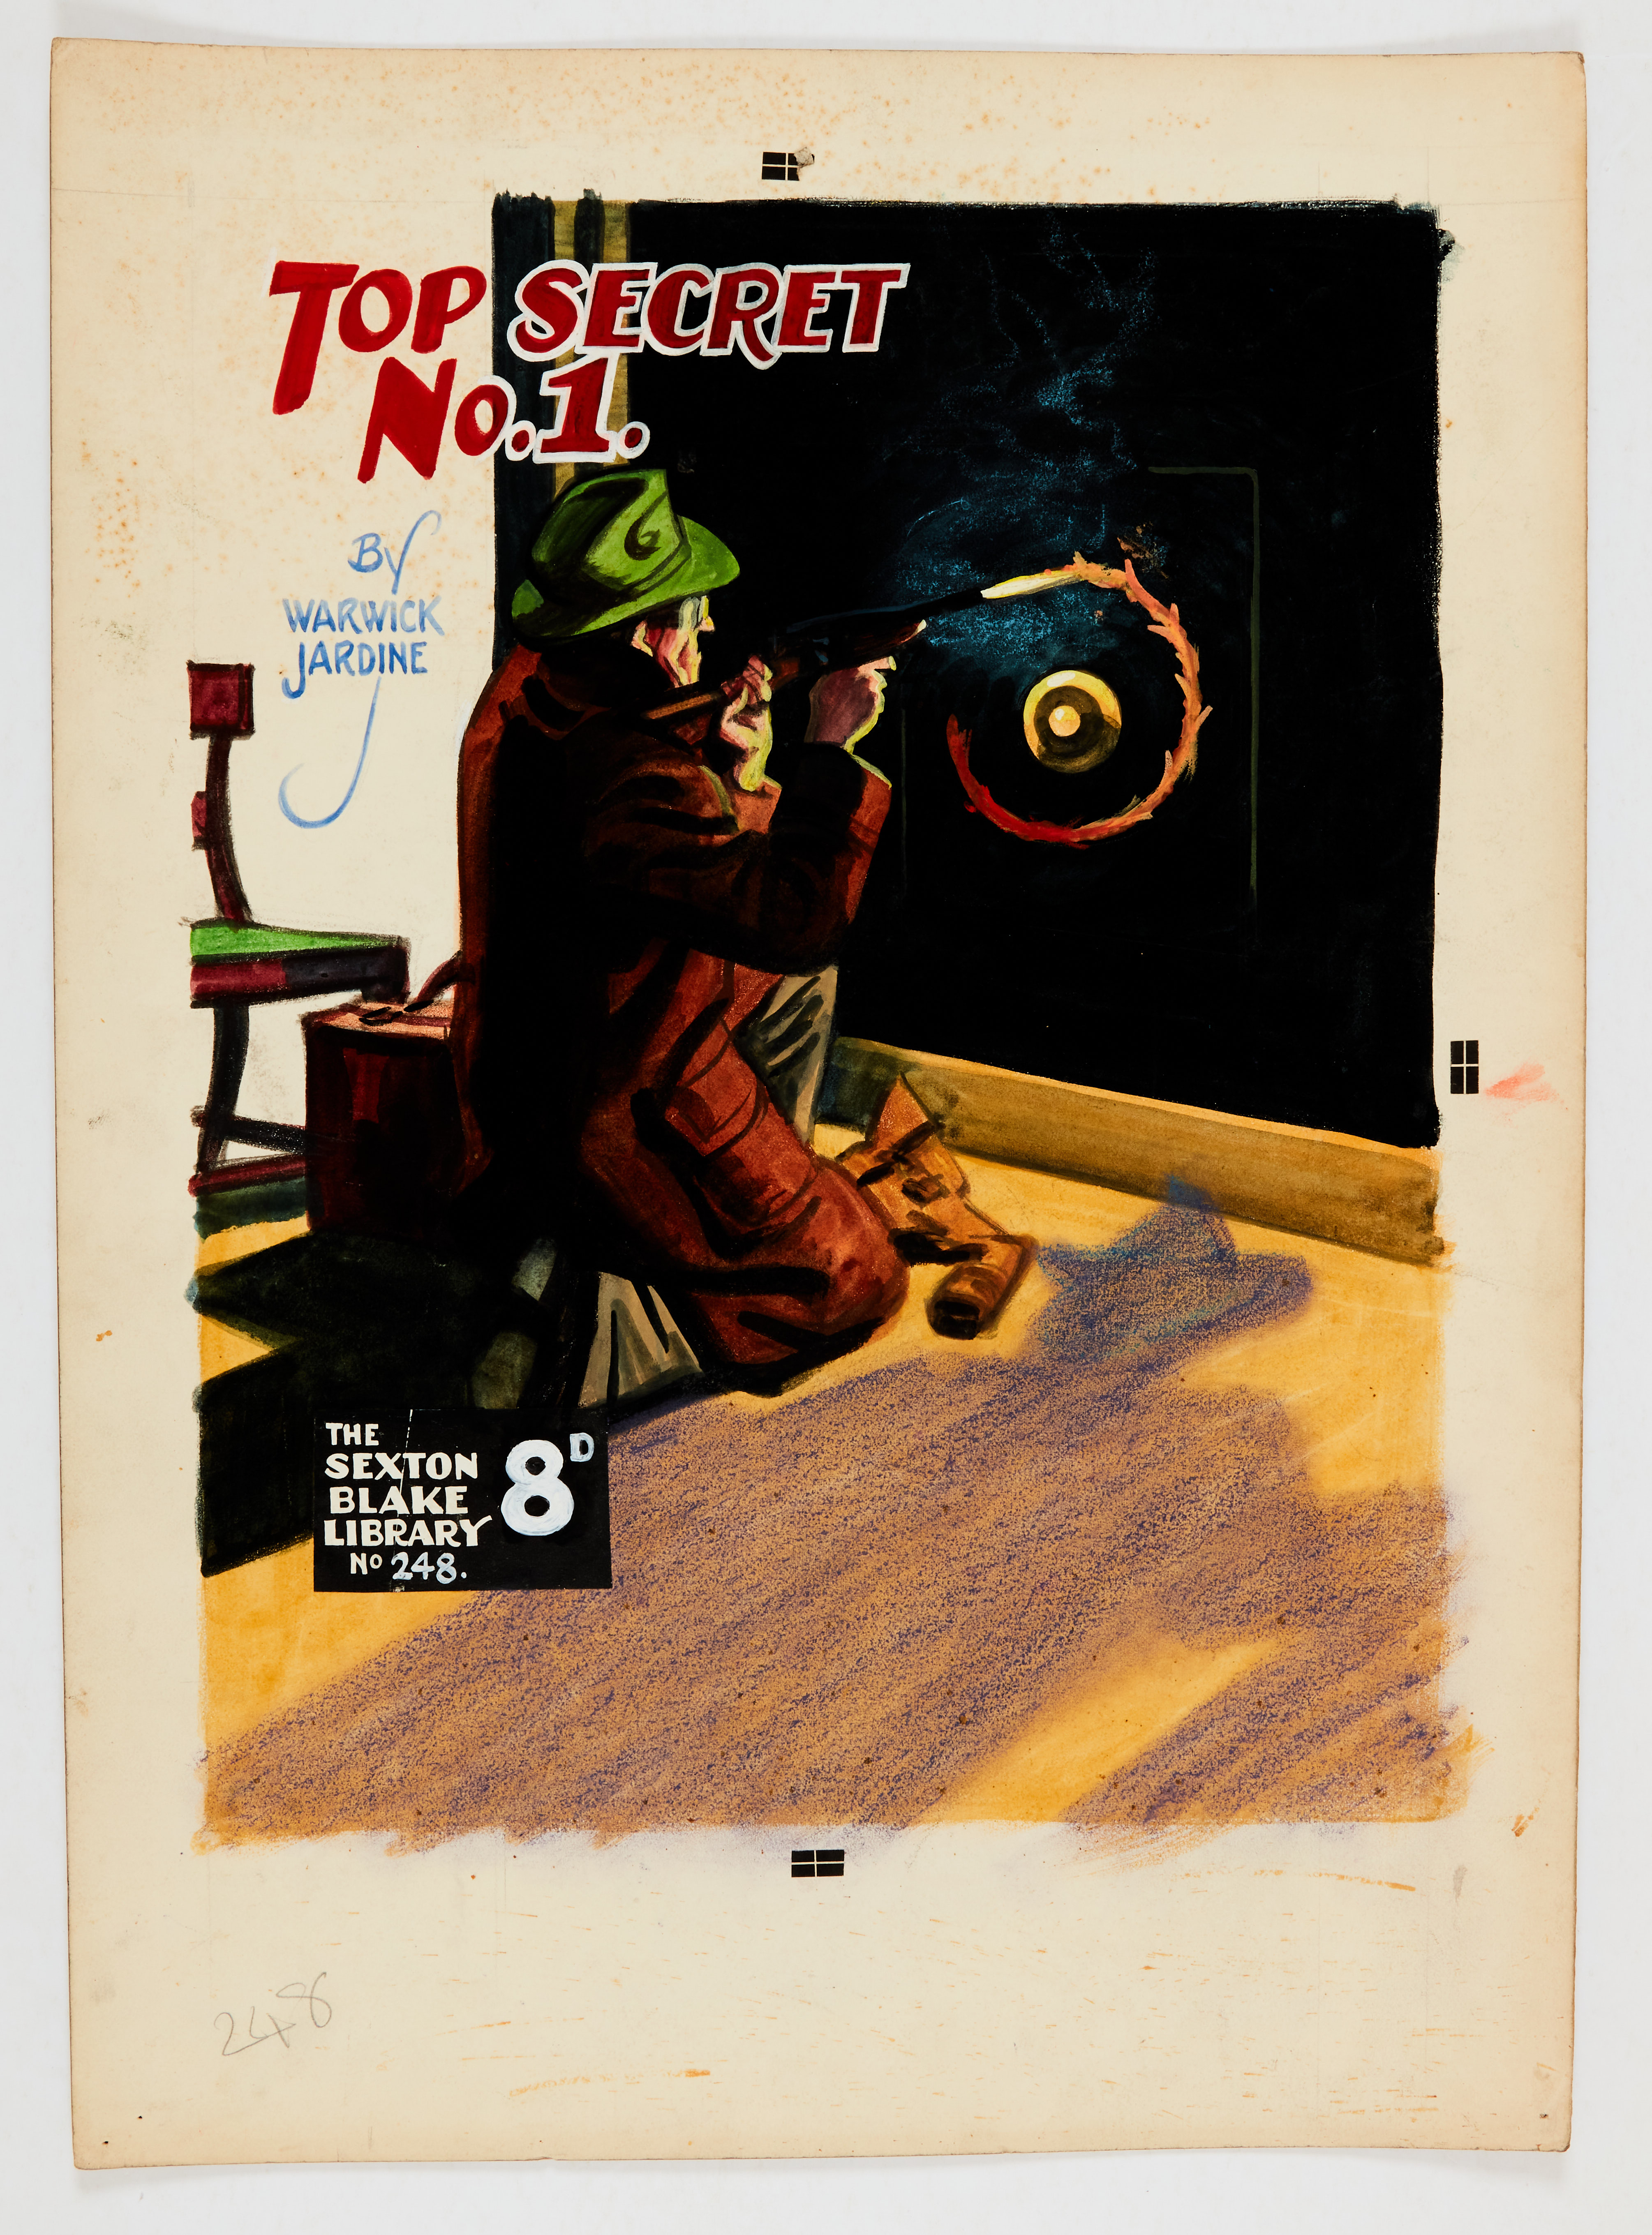 Sexton Blake/Top Secret No 1 original cover artwork by Eric Parker from Sexton Blake Library No